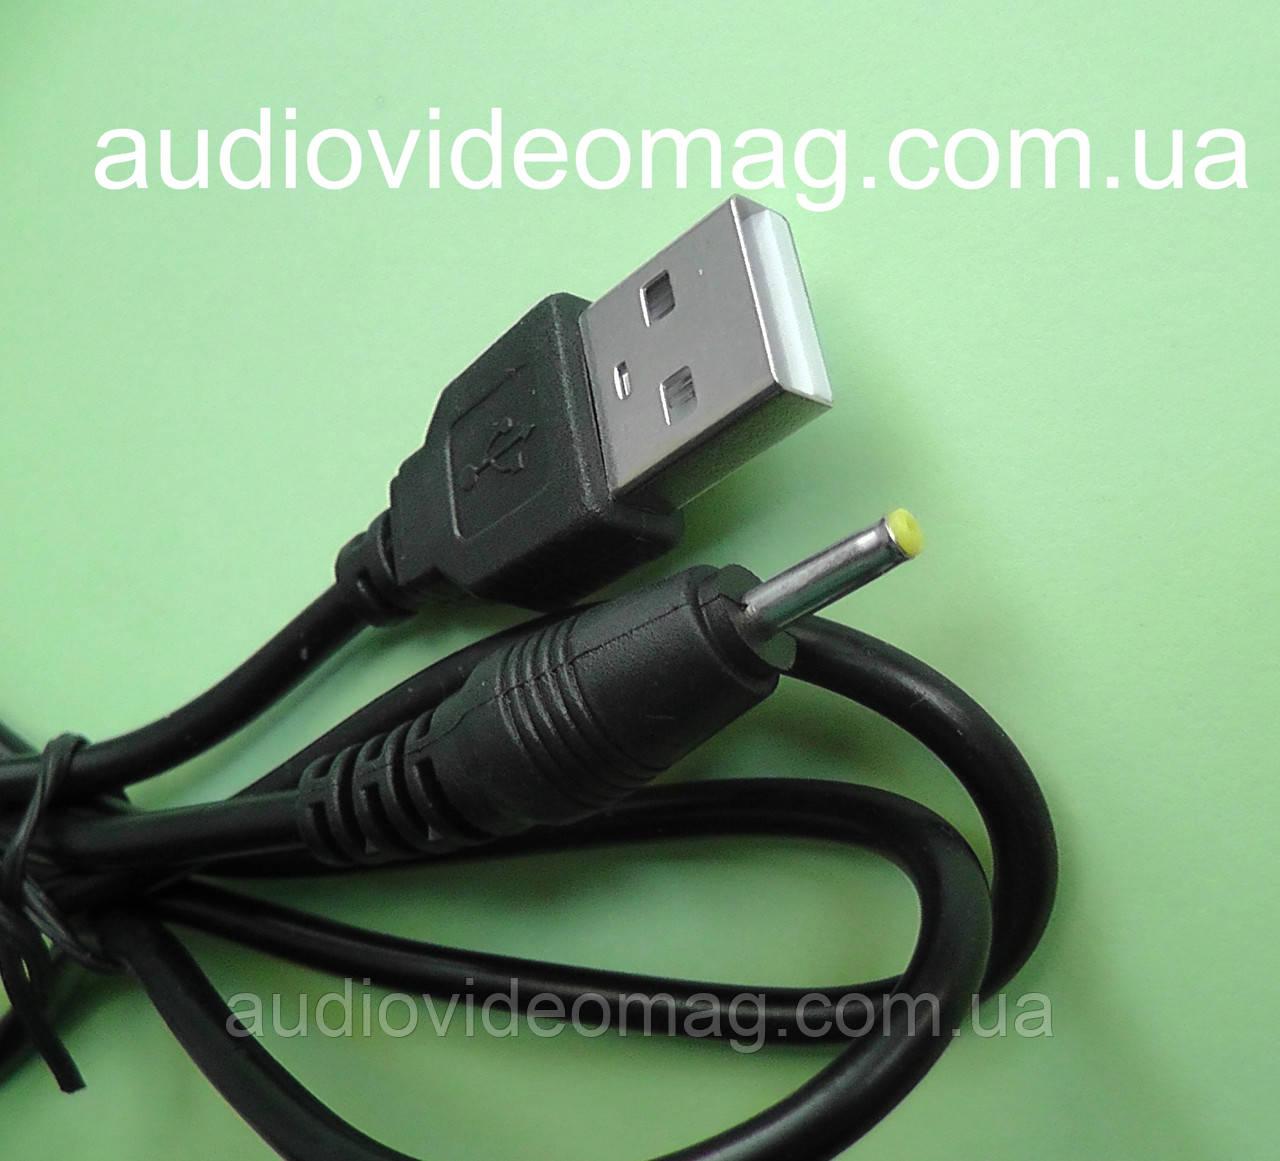 Кабель USB для планшета, штекер 2.5-0.7 мм